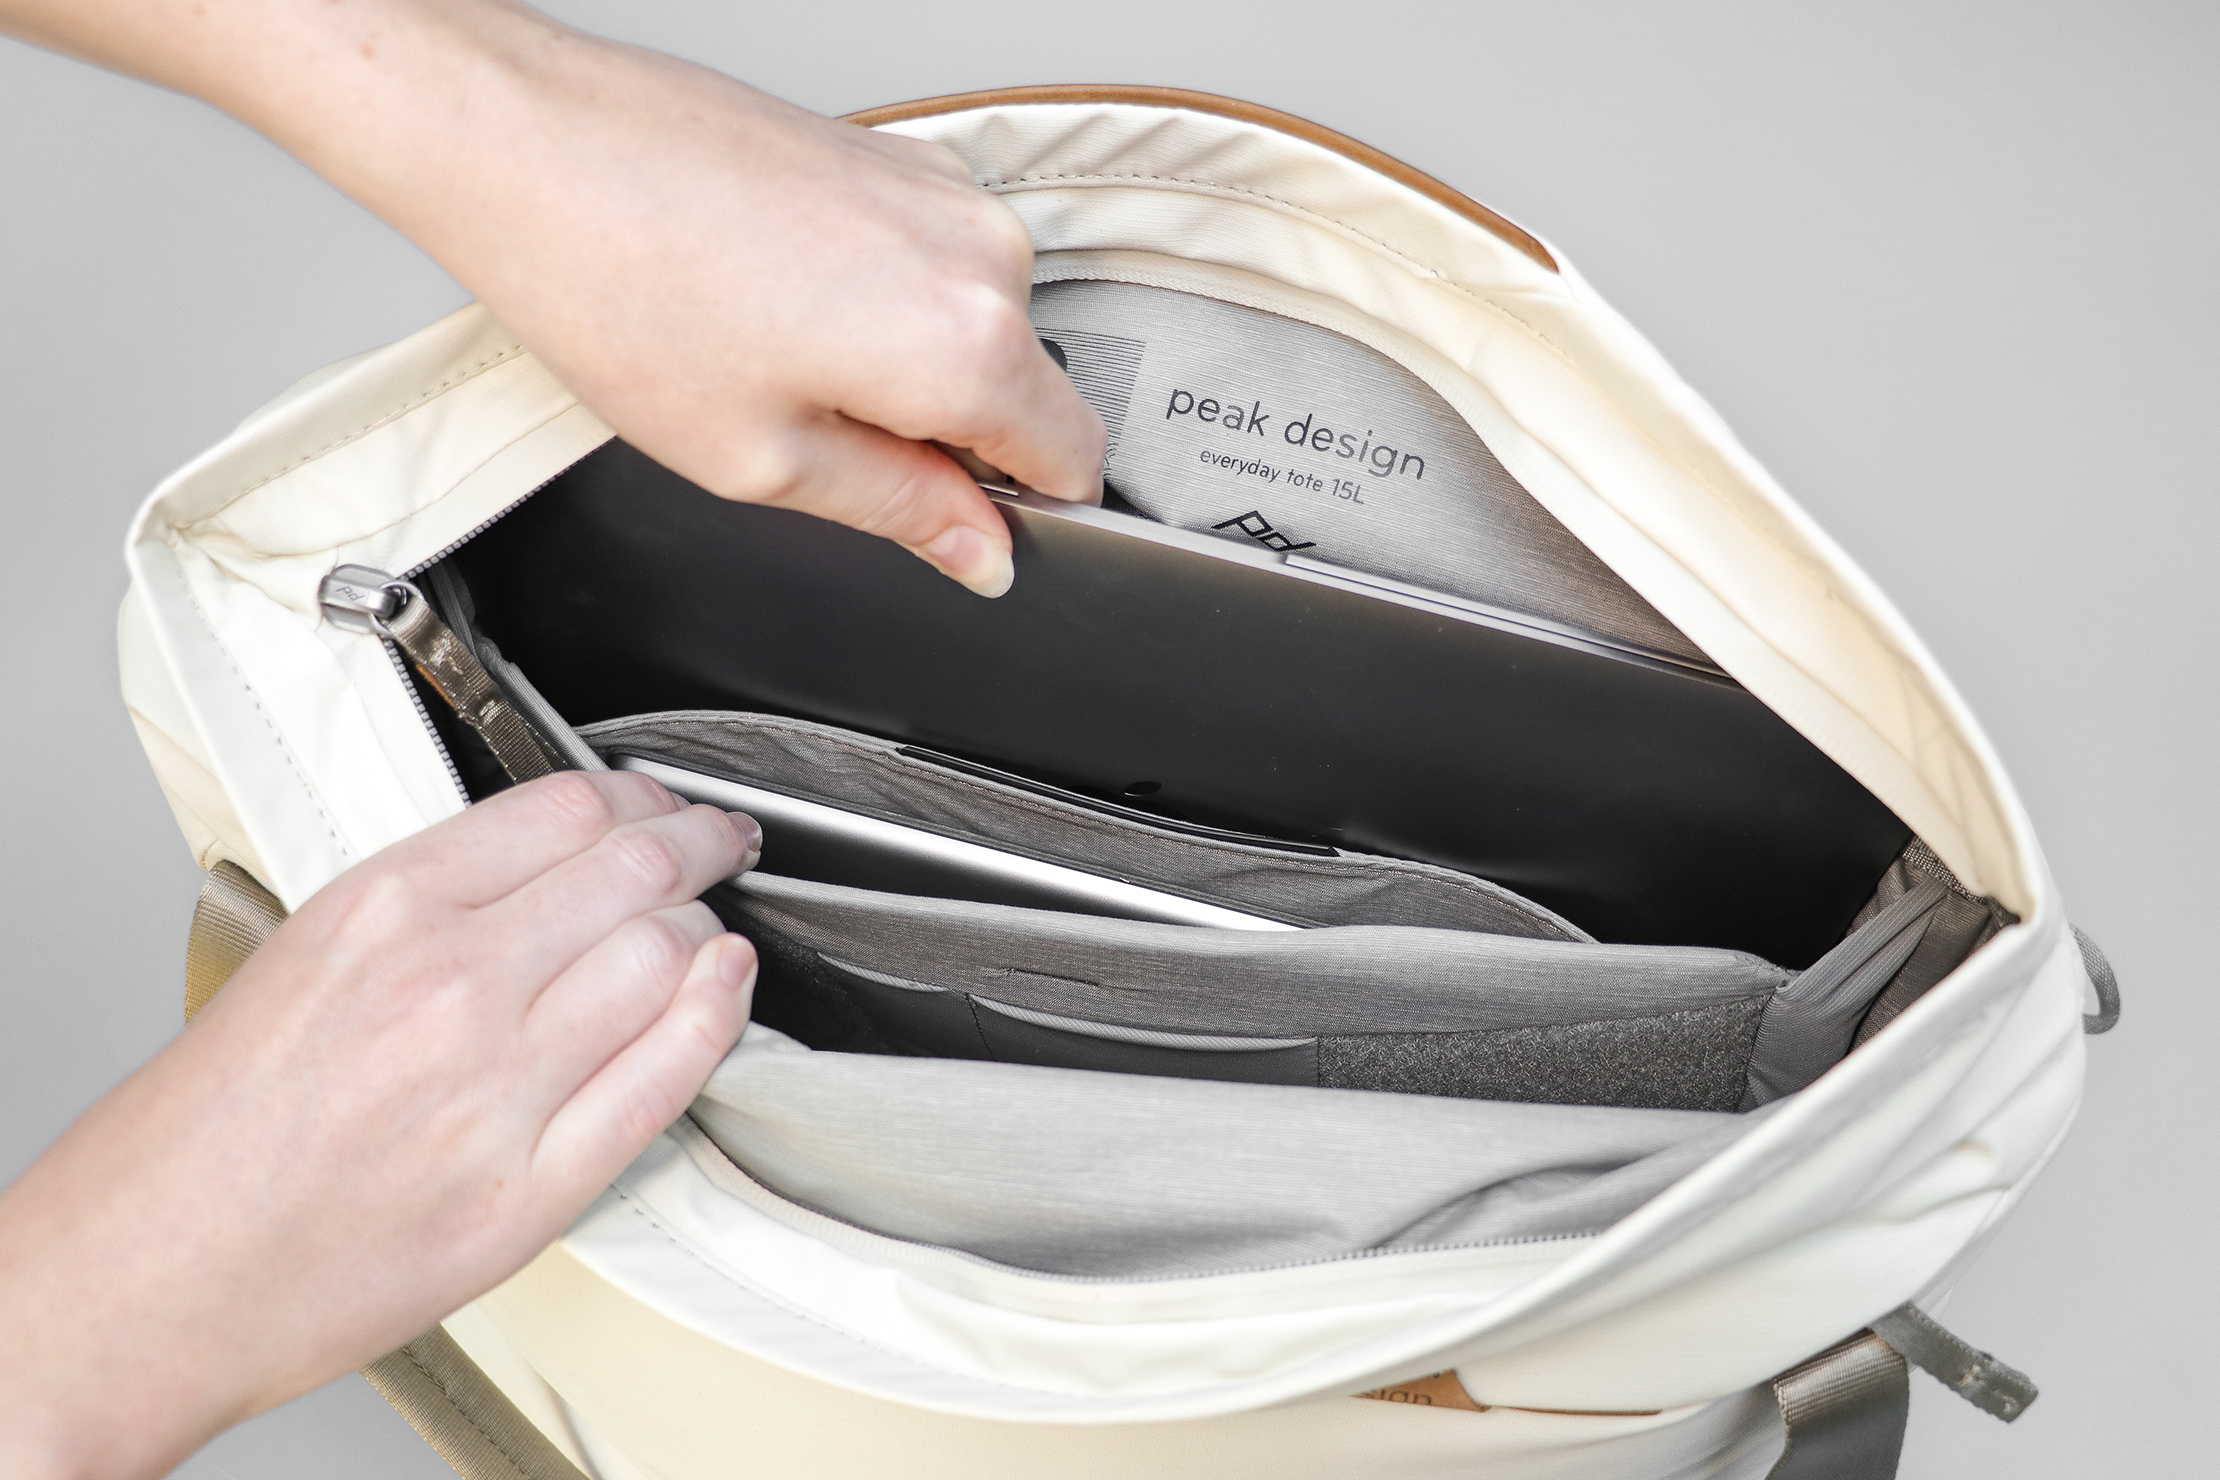 Peak Design Everyday Tote 15L V2 Laptop And Tablet Sleeves